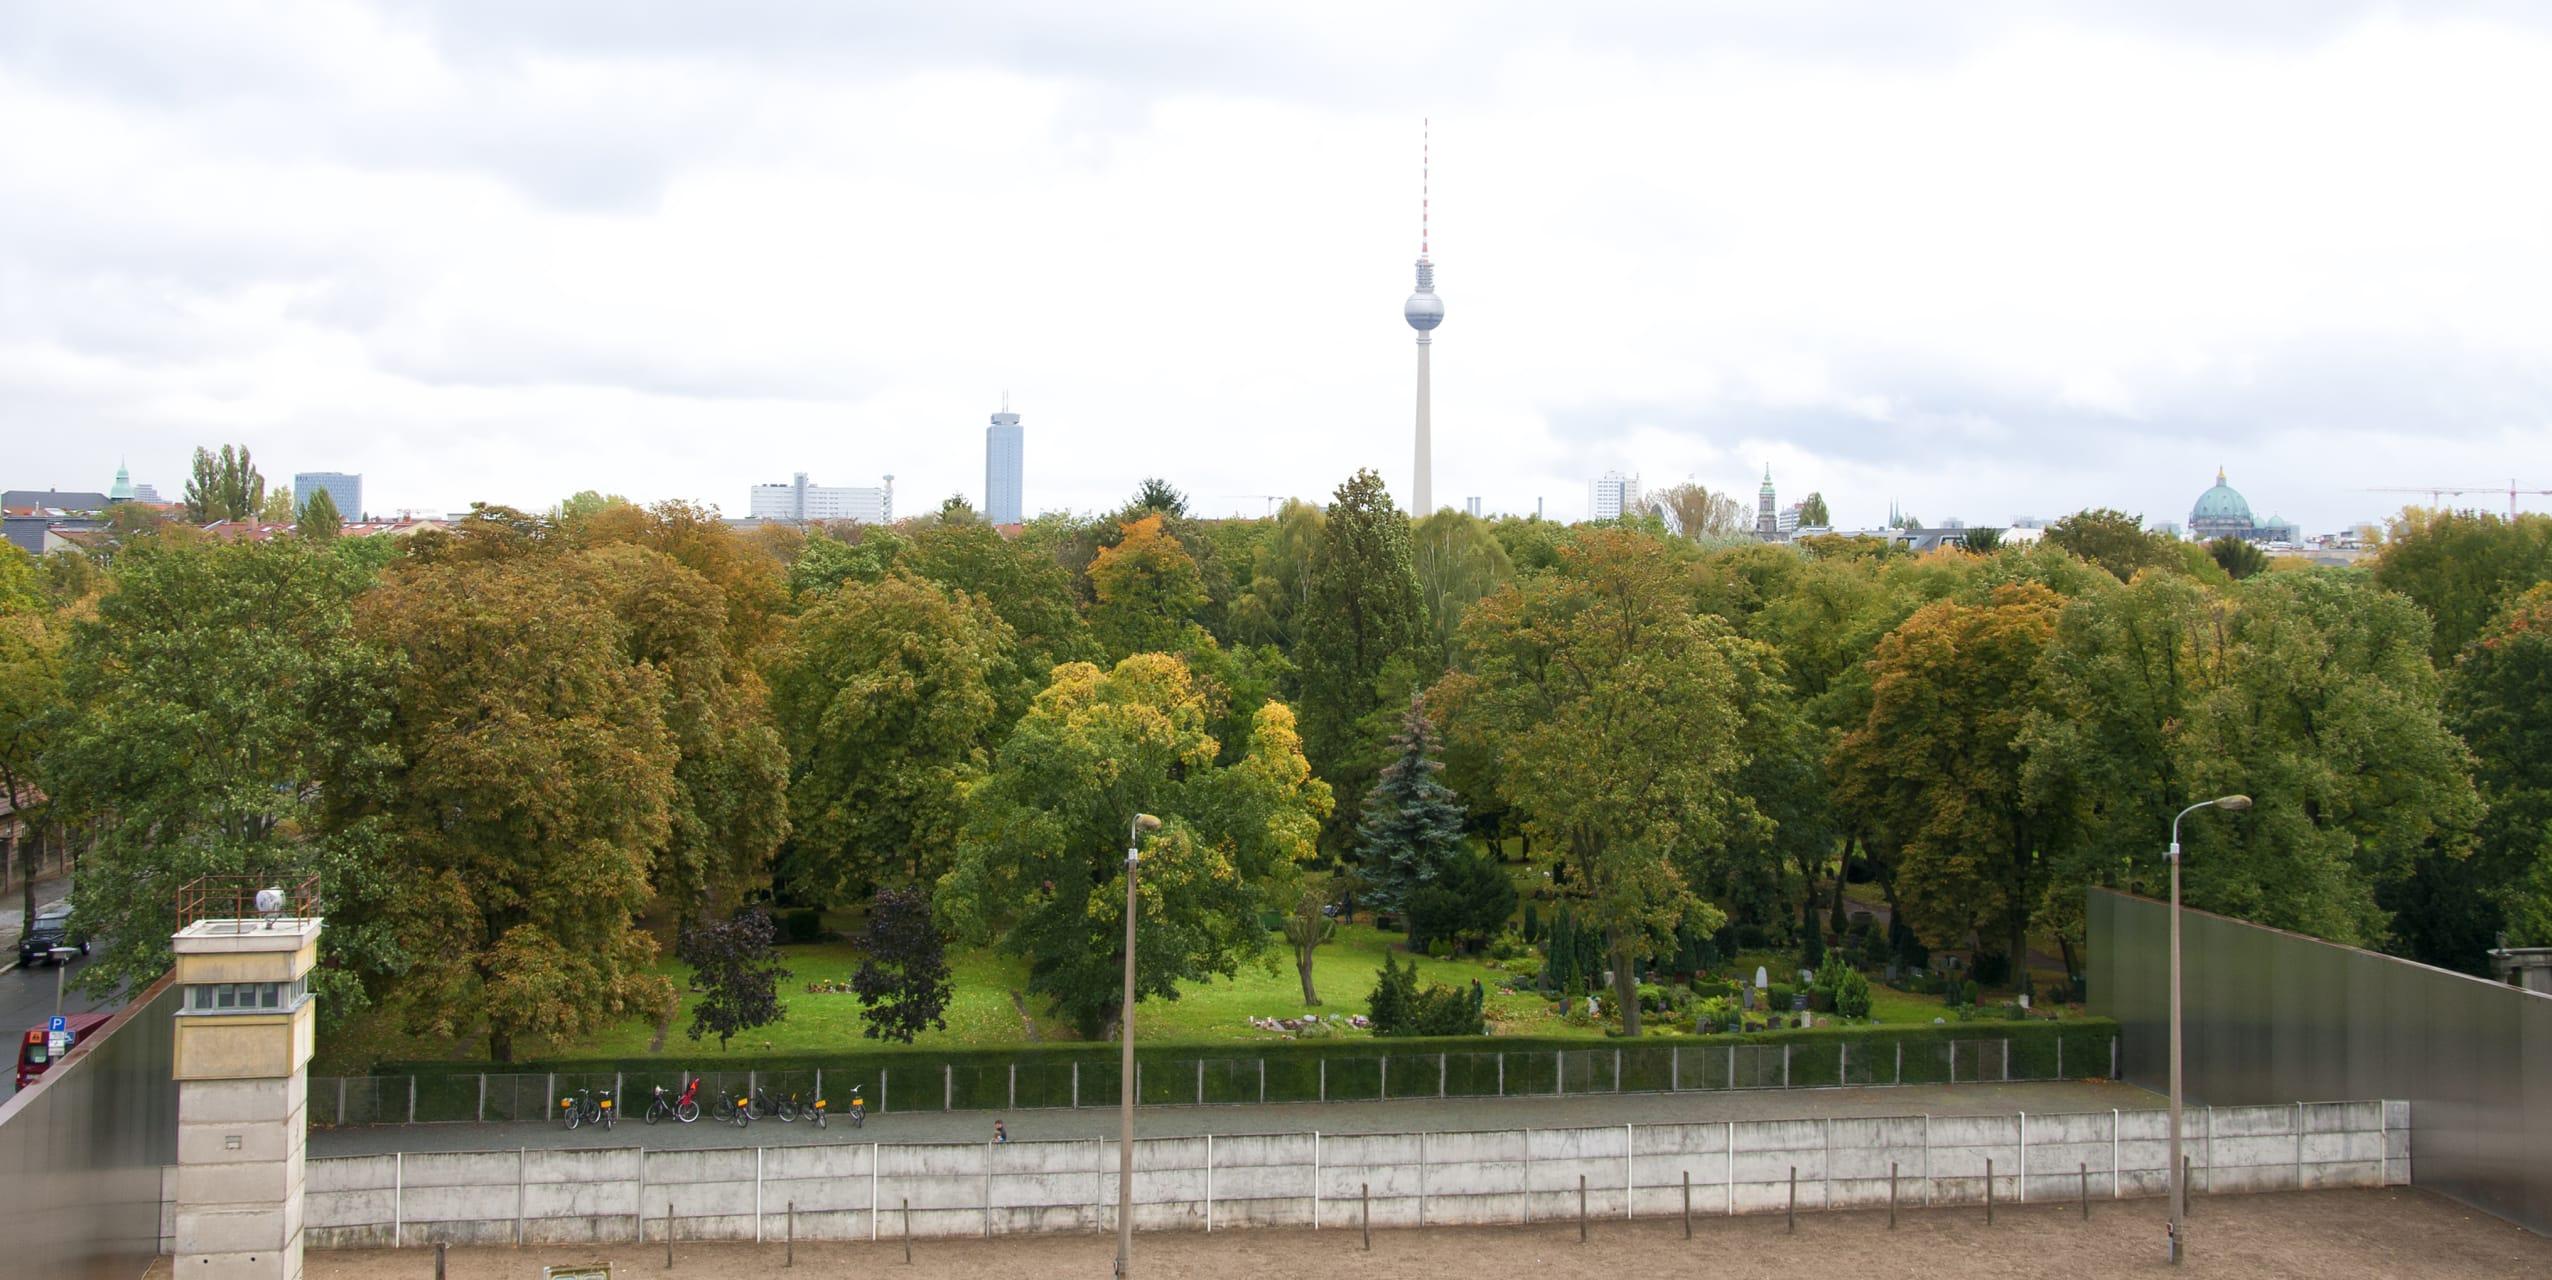 Berlin - A Walk Along Berlin's Wall Memorial